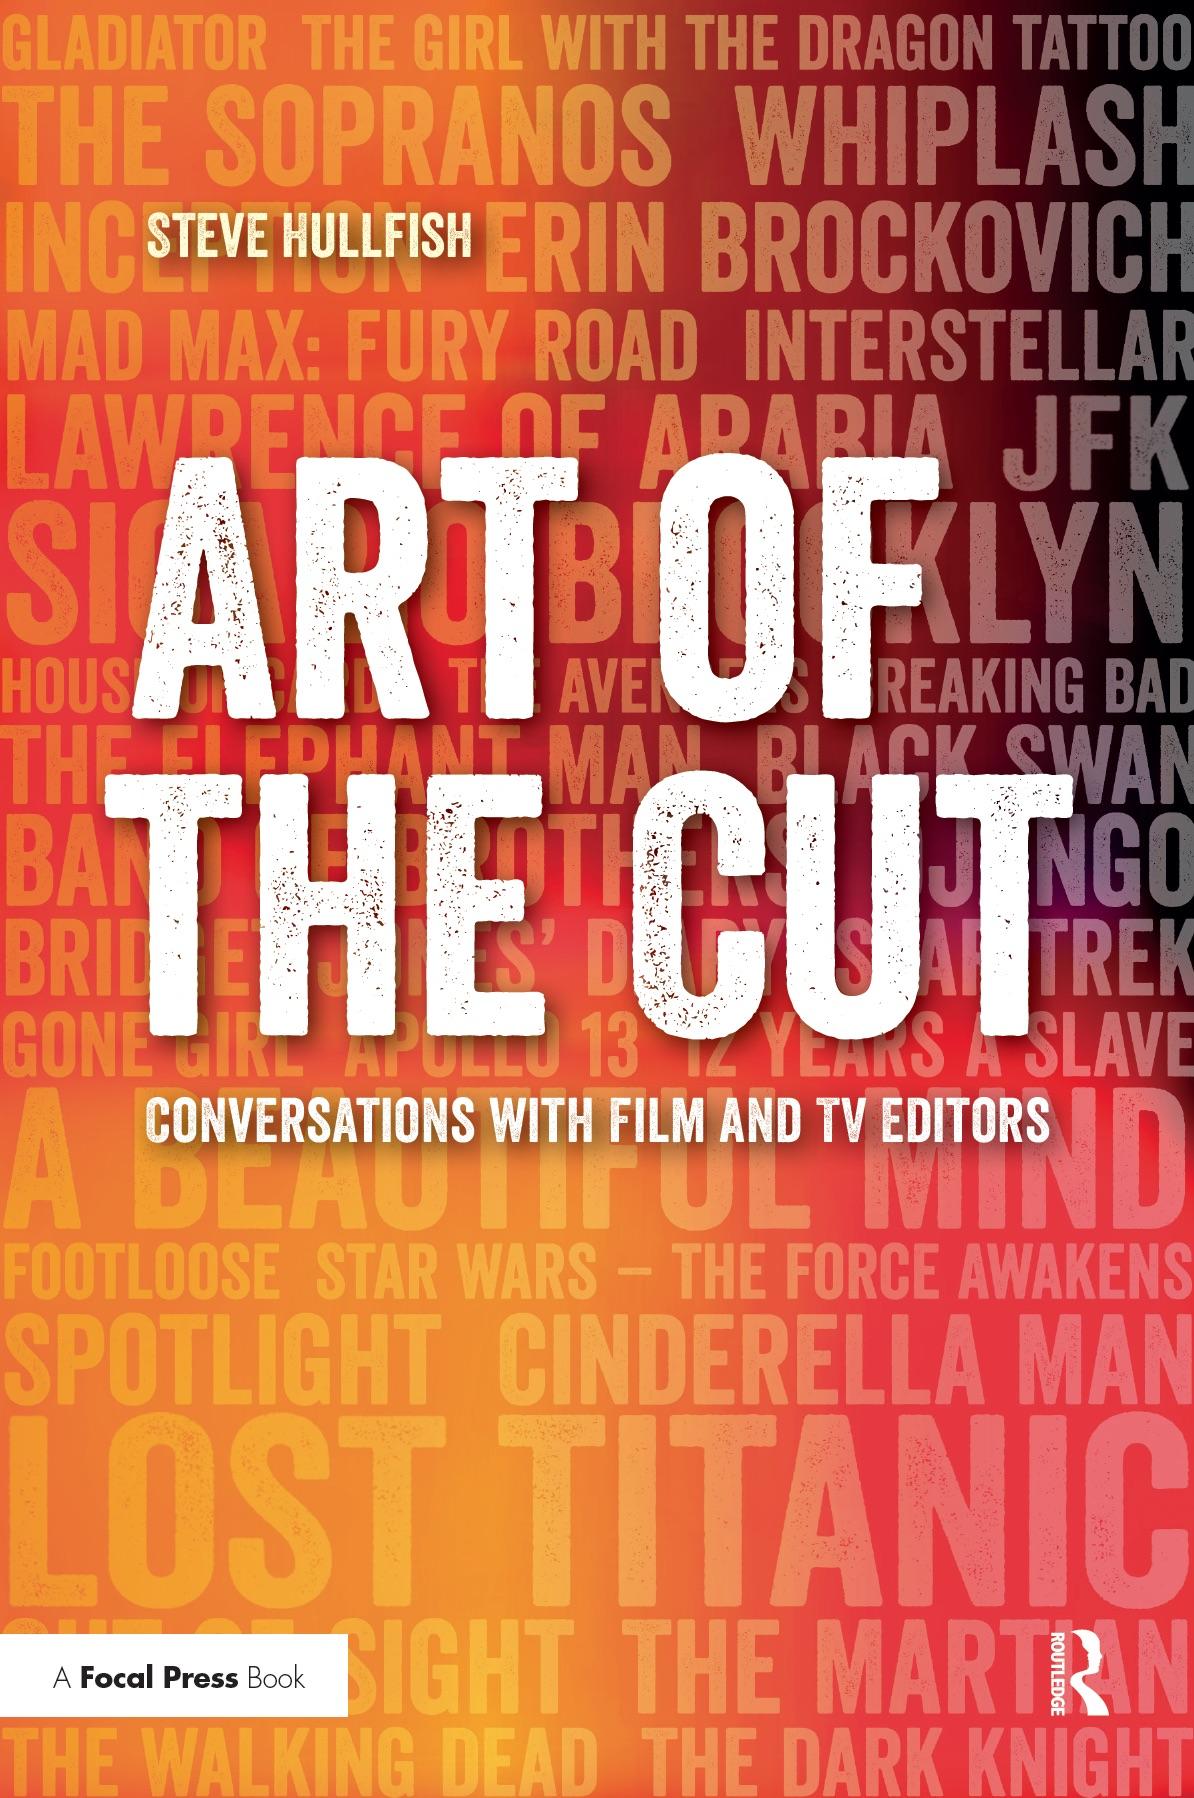 ART OF THE CUT with Atomic Blonde editor Elisabet Ronaldsdottir 16